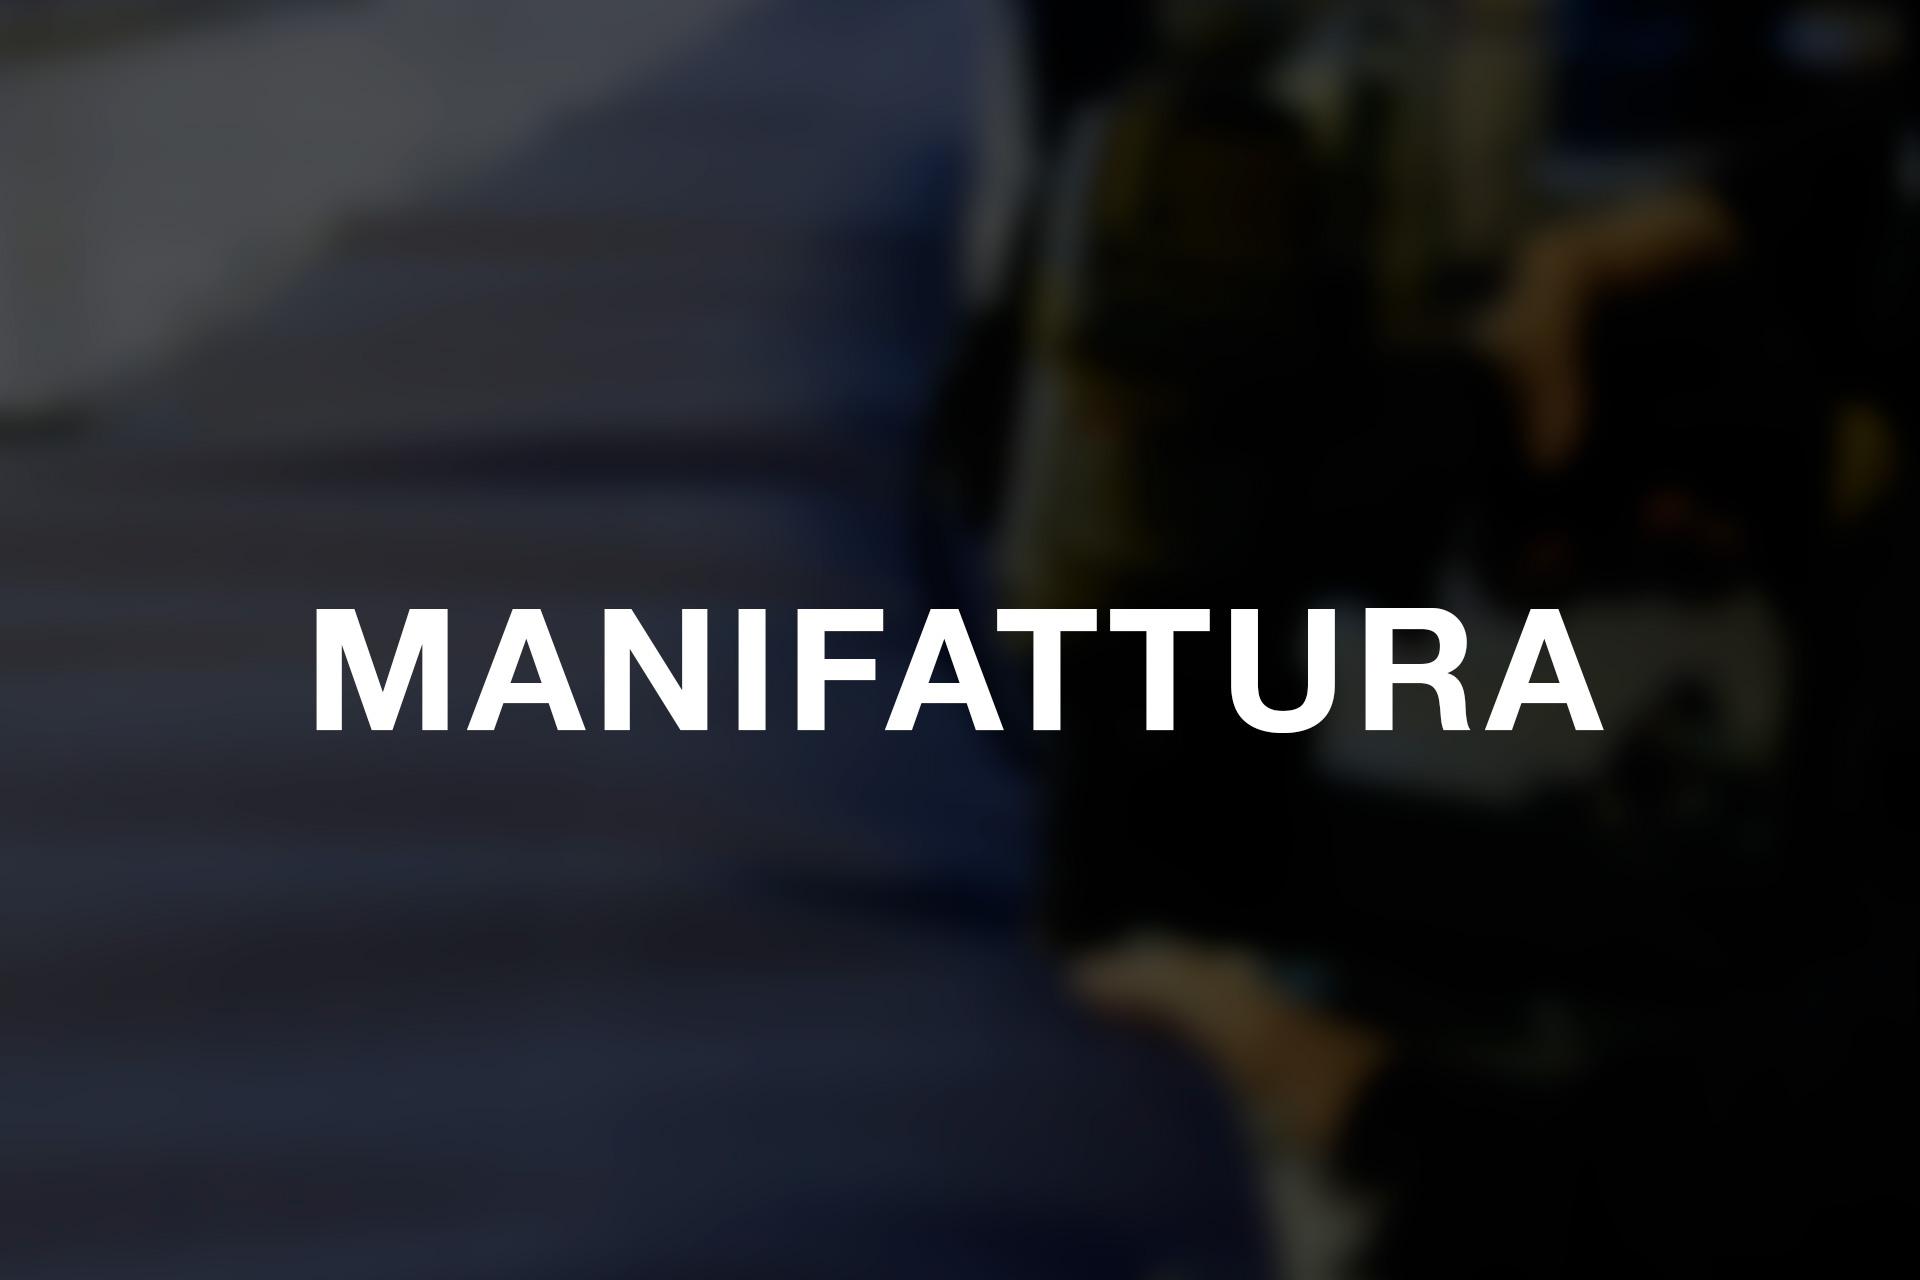 Expansion Joint - Manifattura